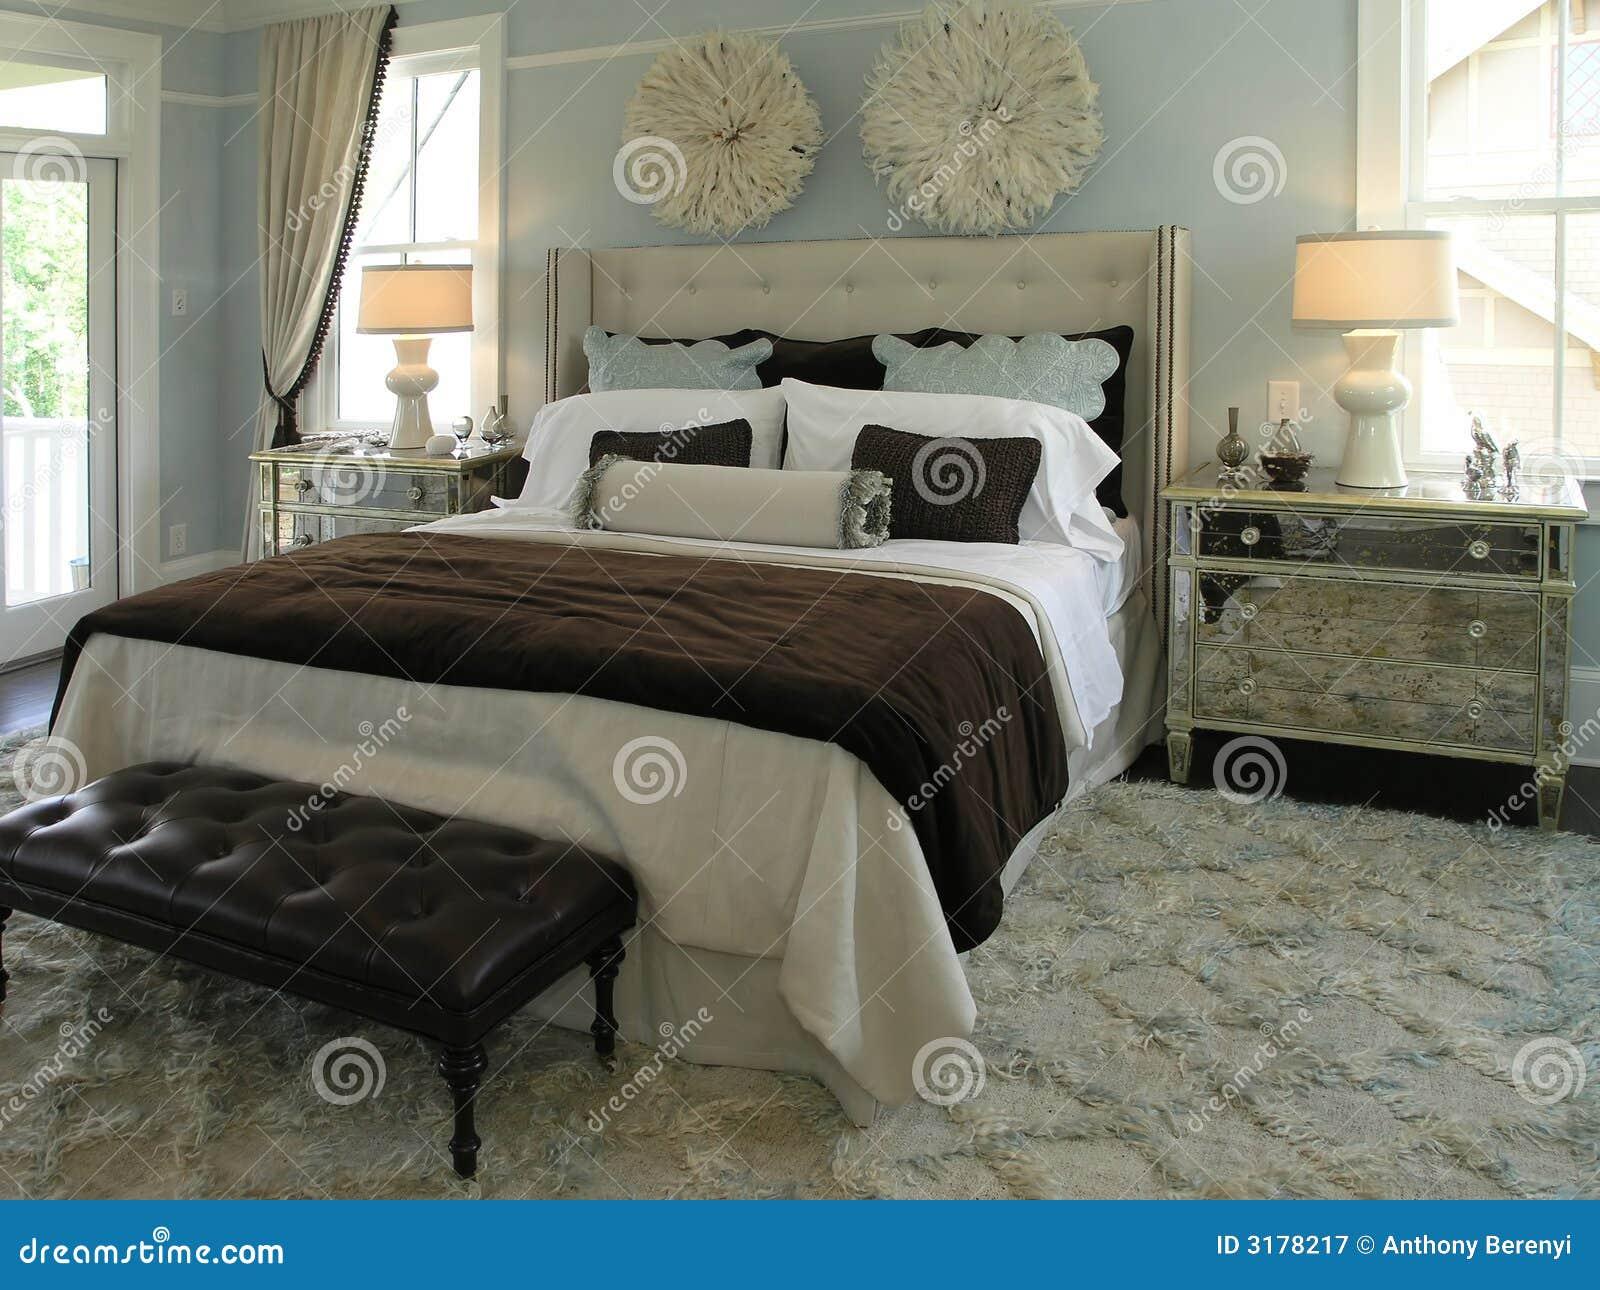 Luxury 4 - Bedroom 1